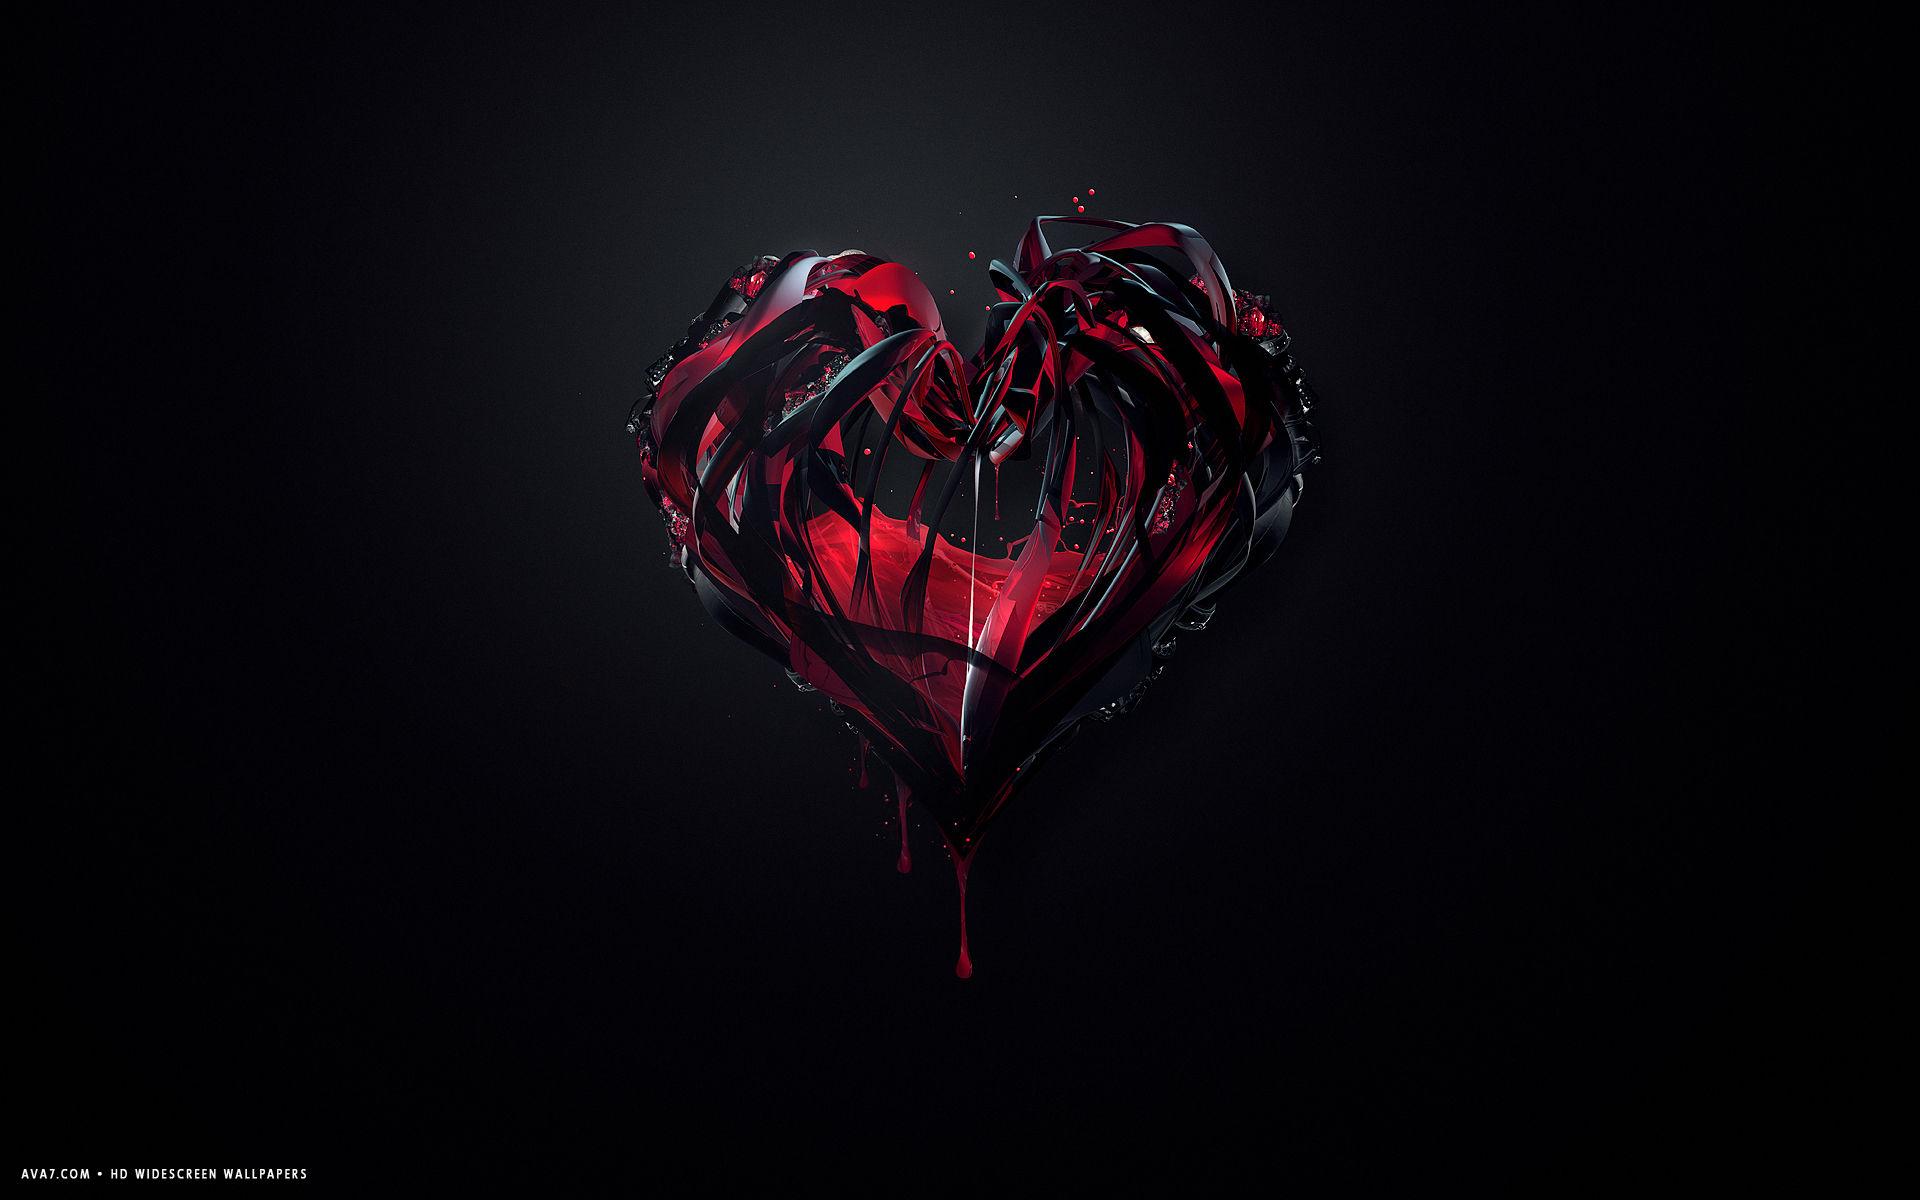 Broken Red Black Heart Lines Glass Drops Melting Hd Widescreen